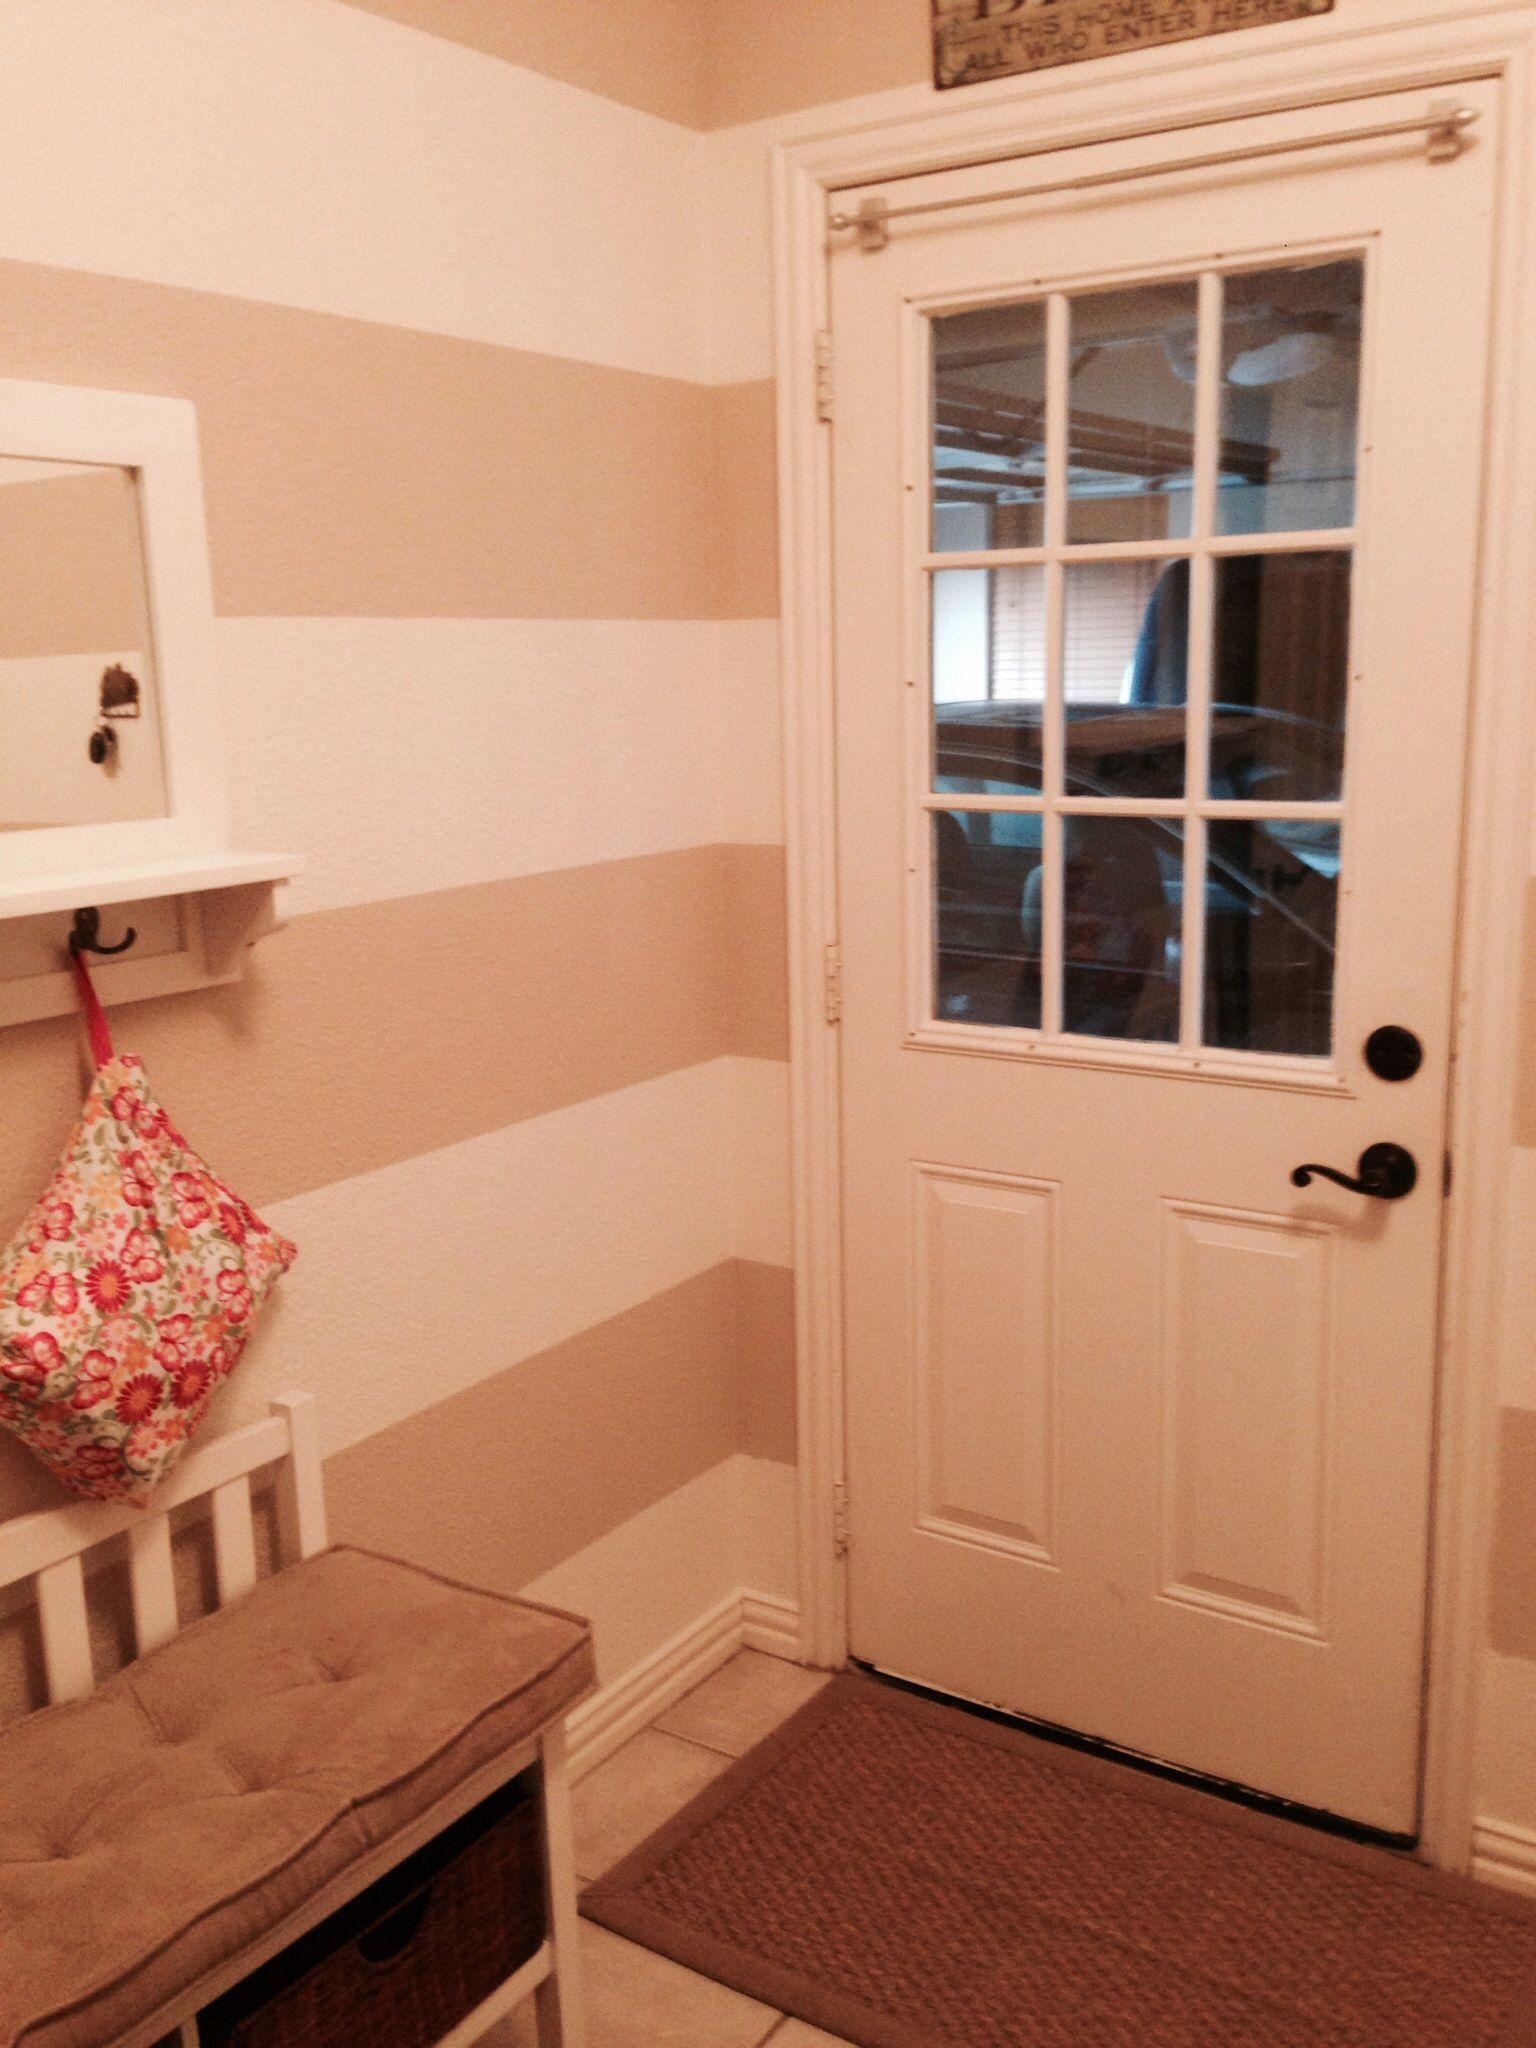 Horizontal Stripes Laundry Room Wall Sherwin Williams Creamy White and Kilim Beige--thank you, honey!